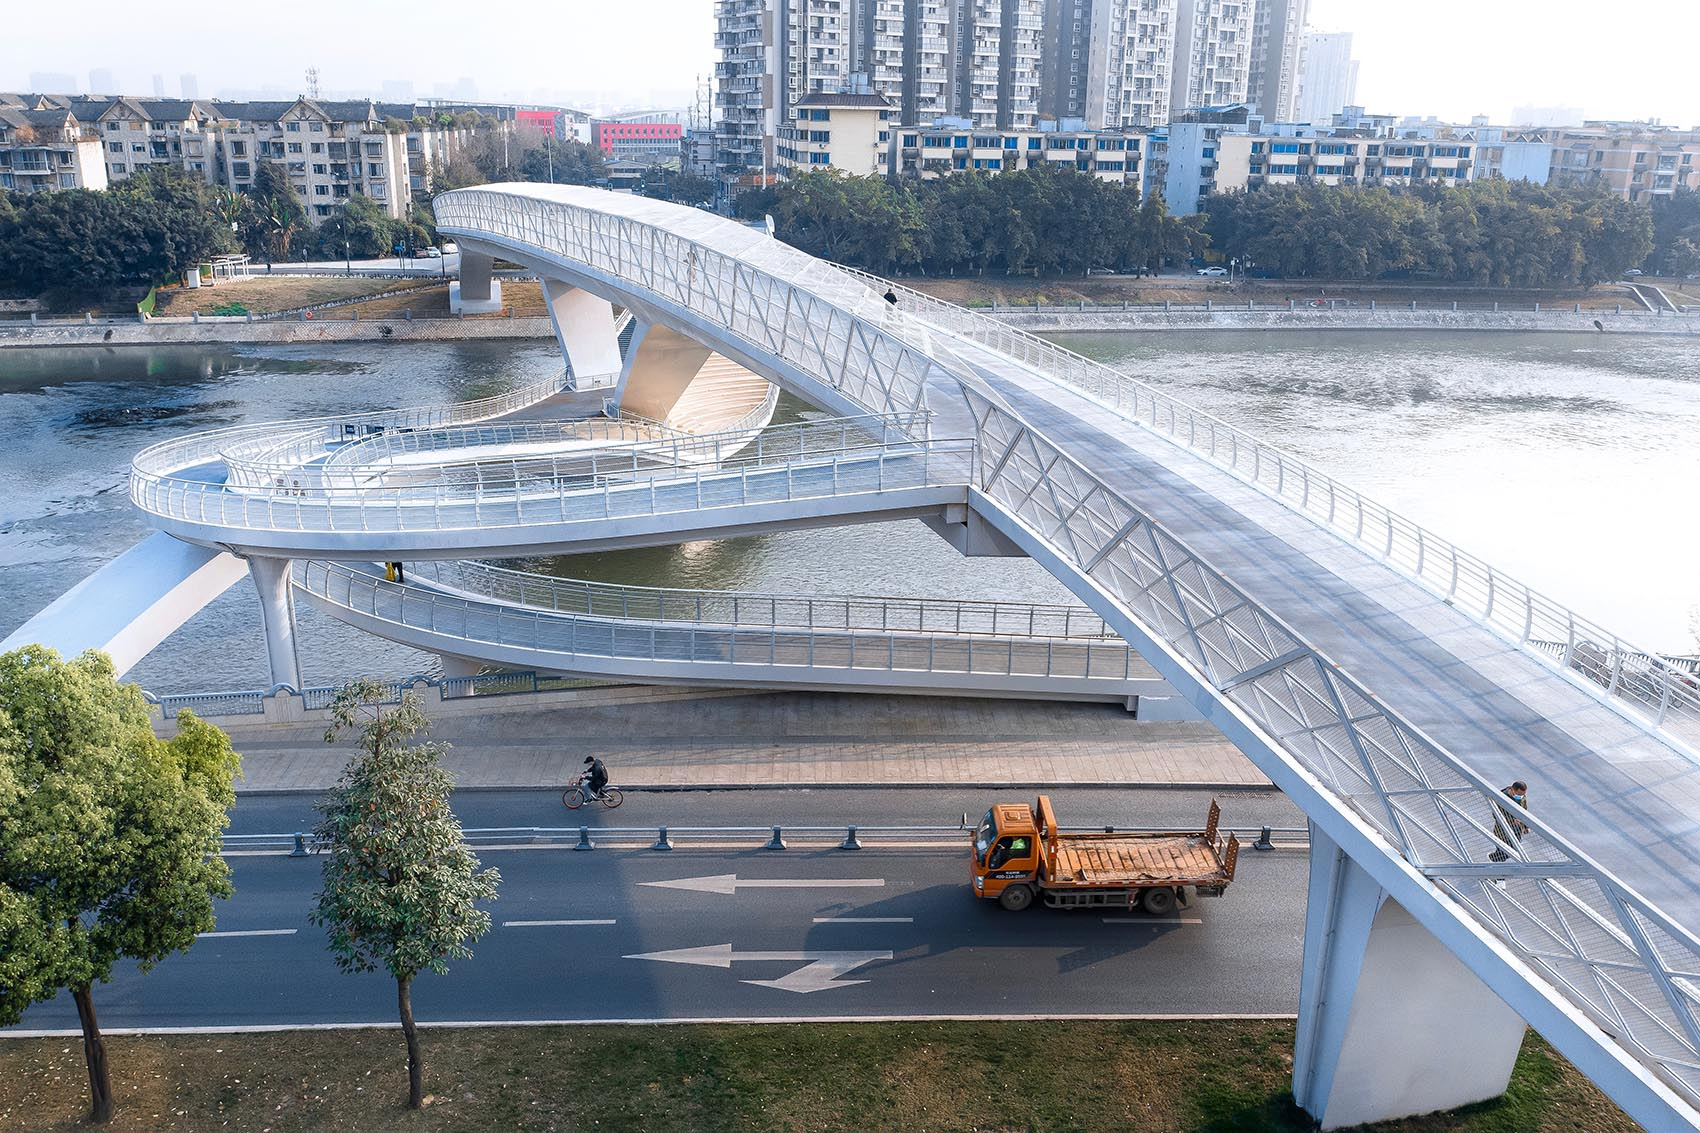 Daylight Shot 五岔子大橋 - Wuchazi Bridge (INFINITE LOOP)